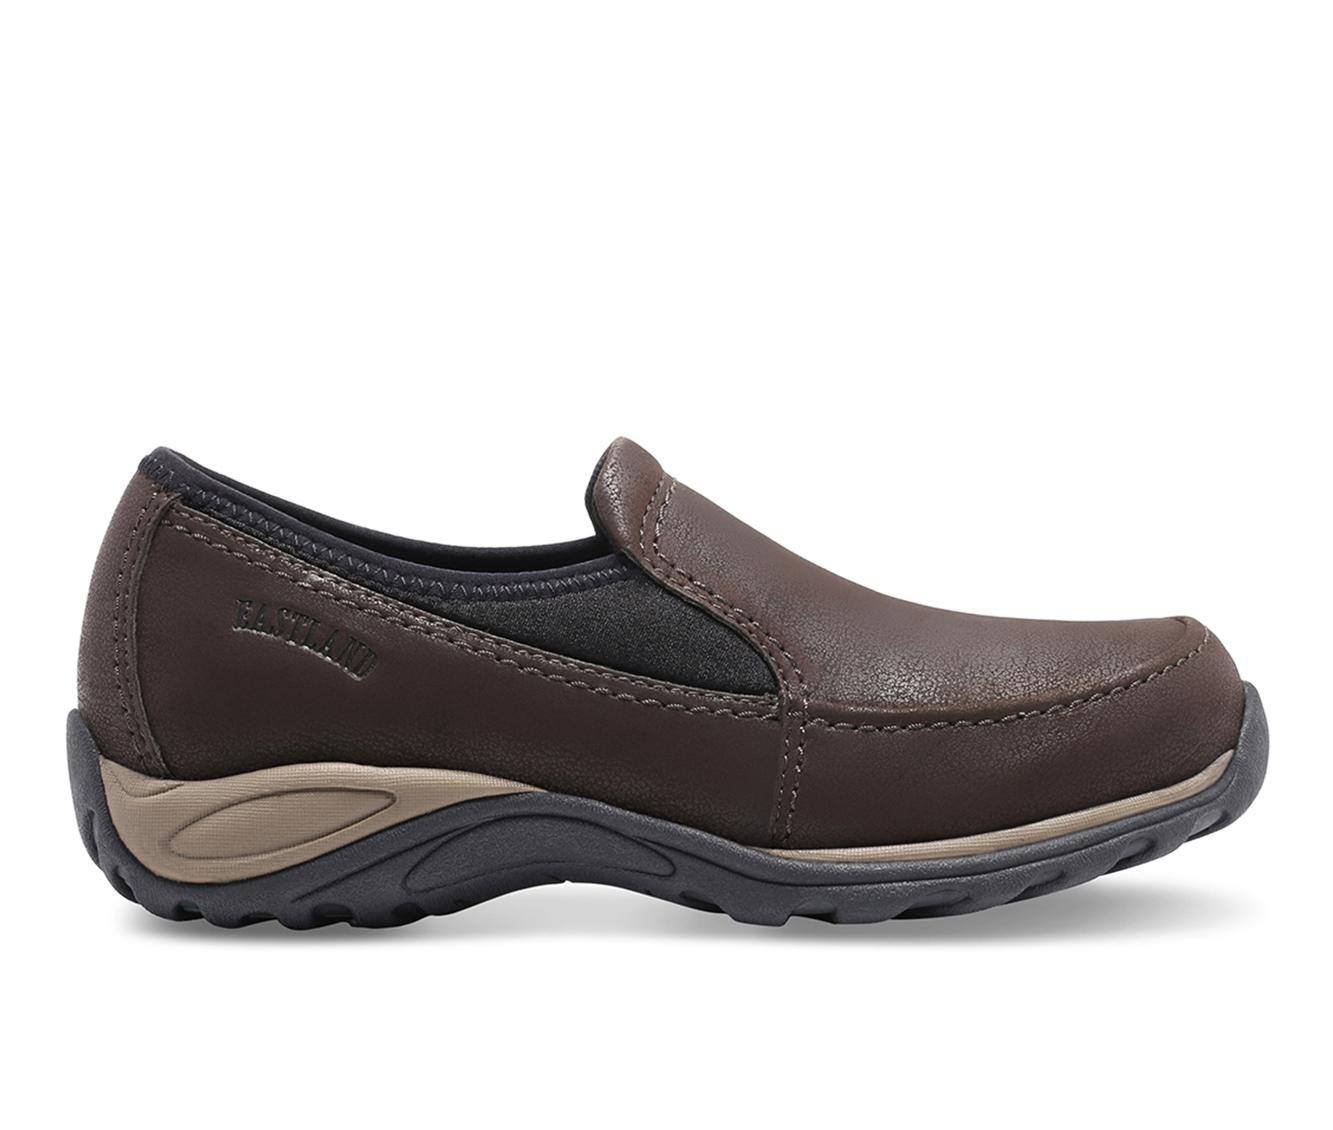 Eastland Sylvia Women's Shoe (Brown Leather)